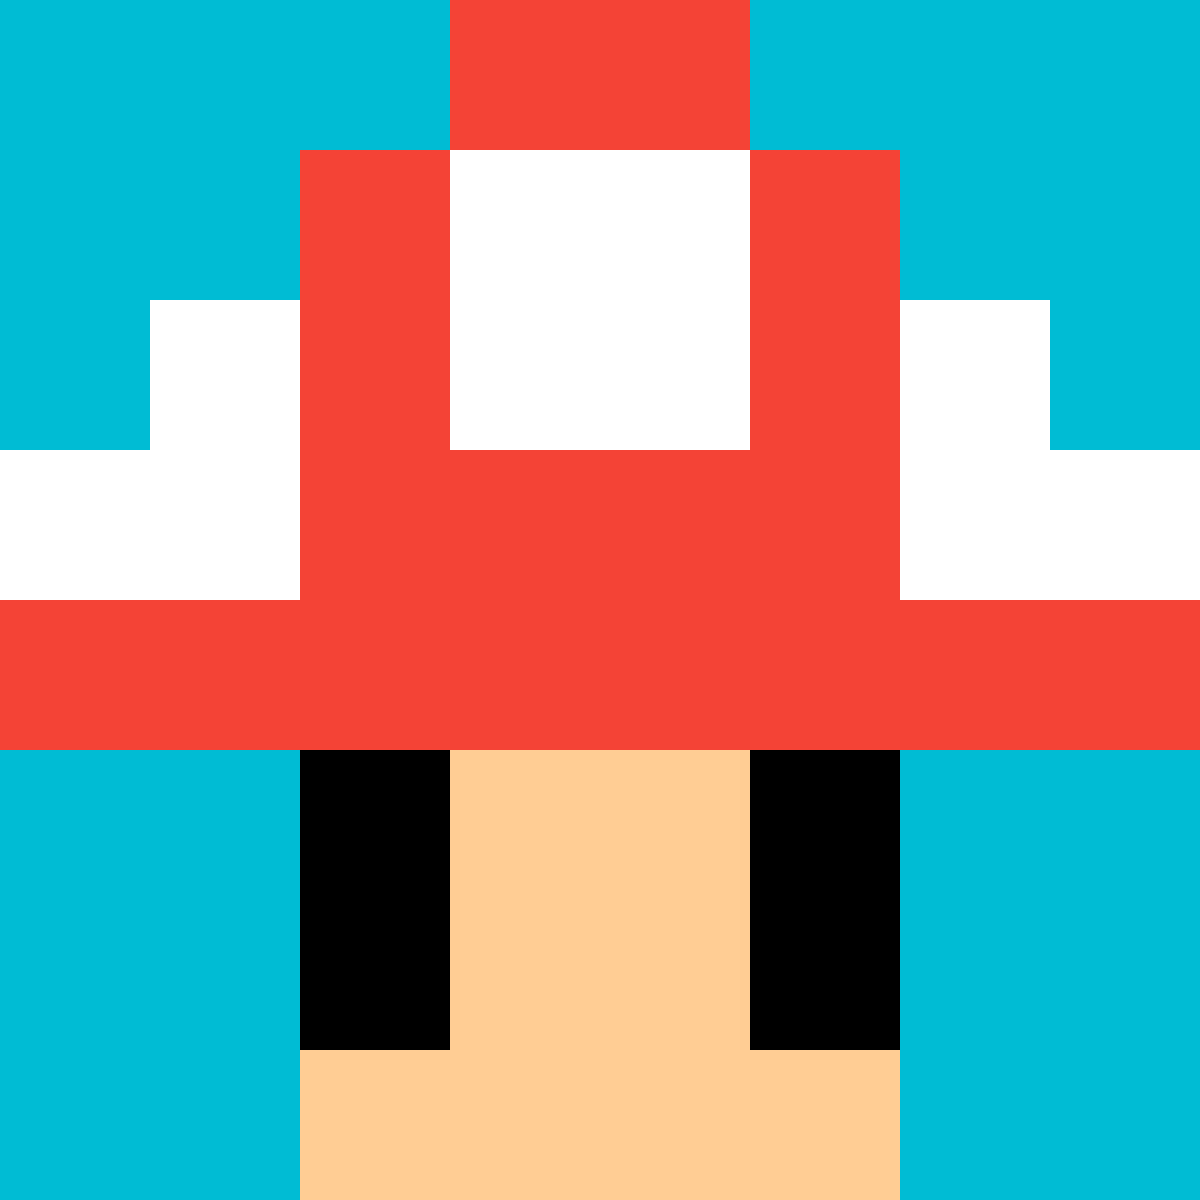 Mario Mushroom by WasabiCat